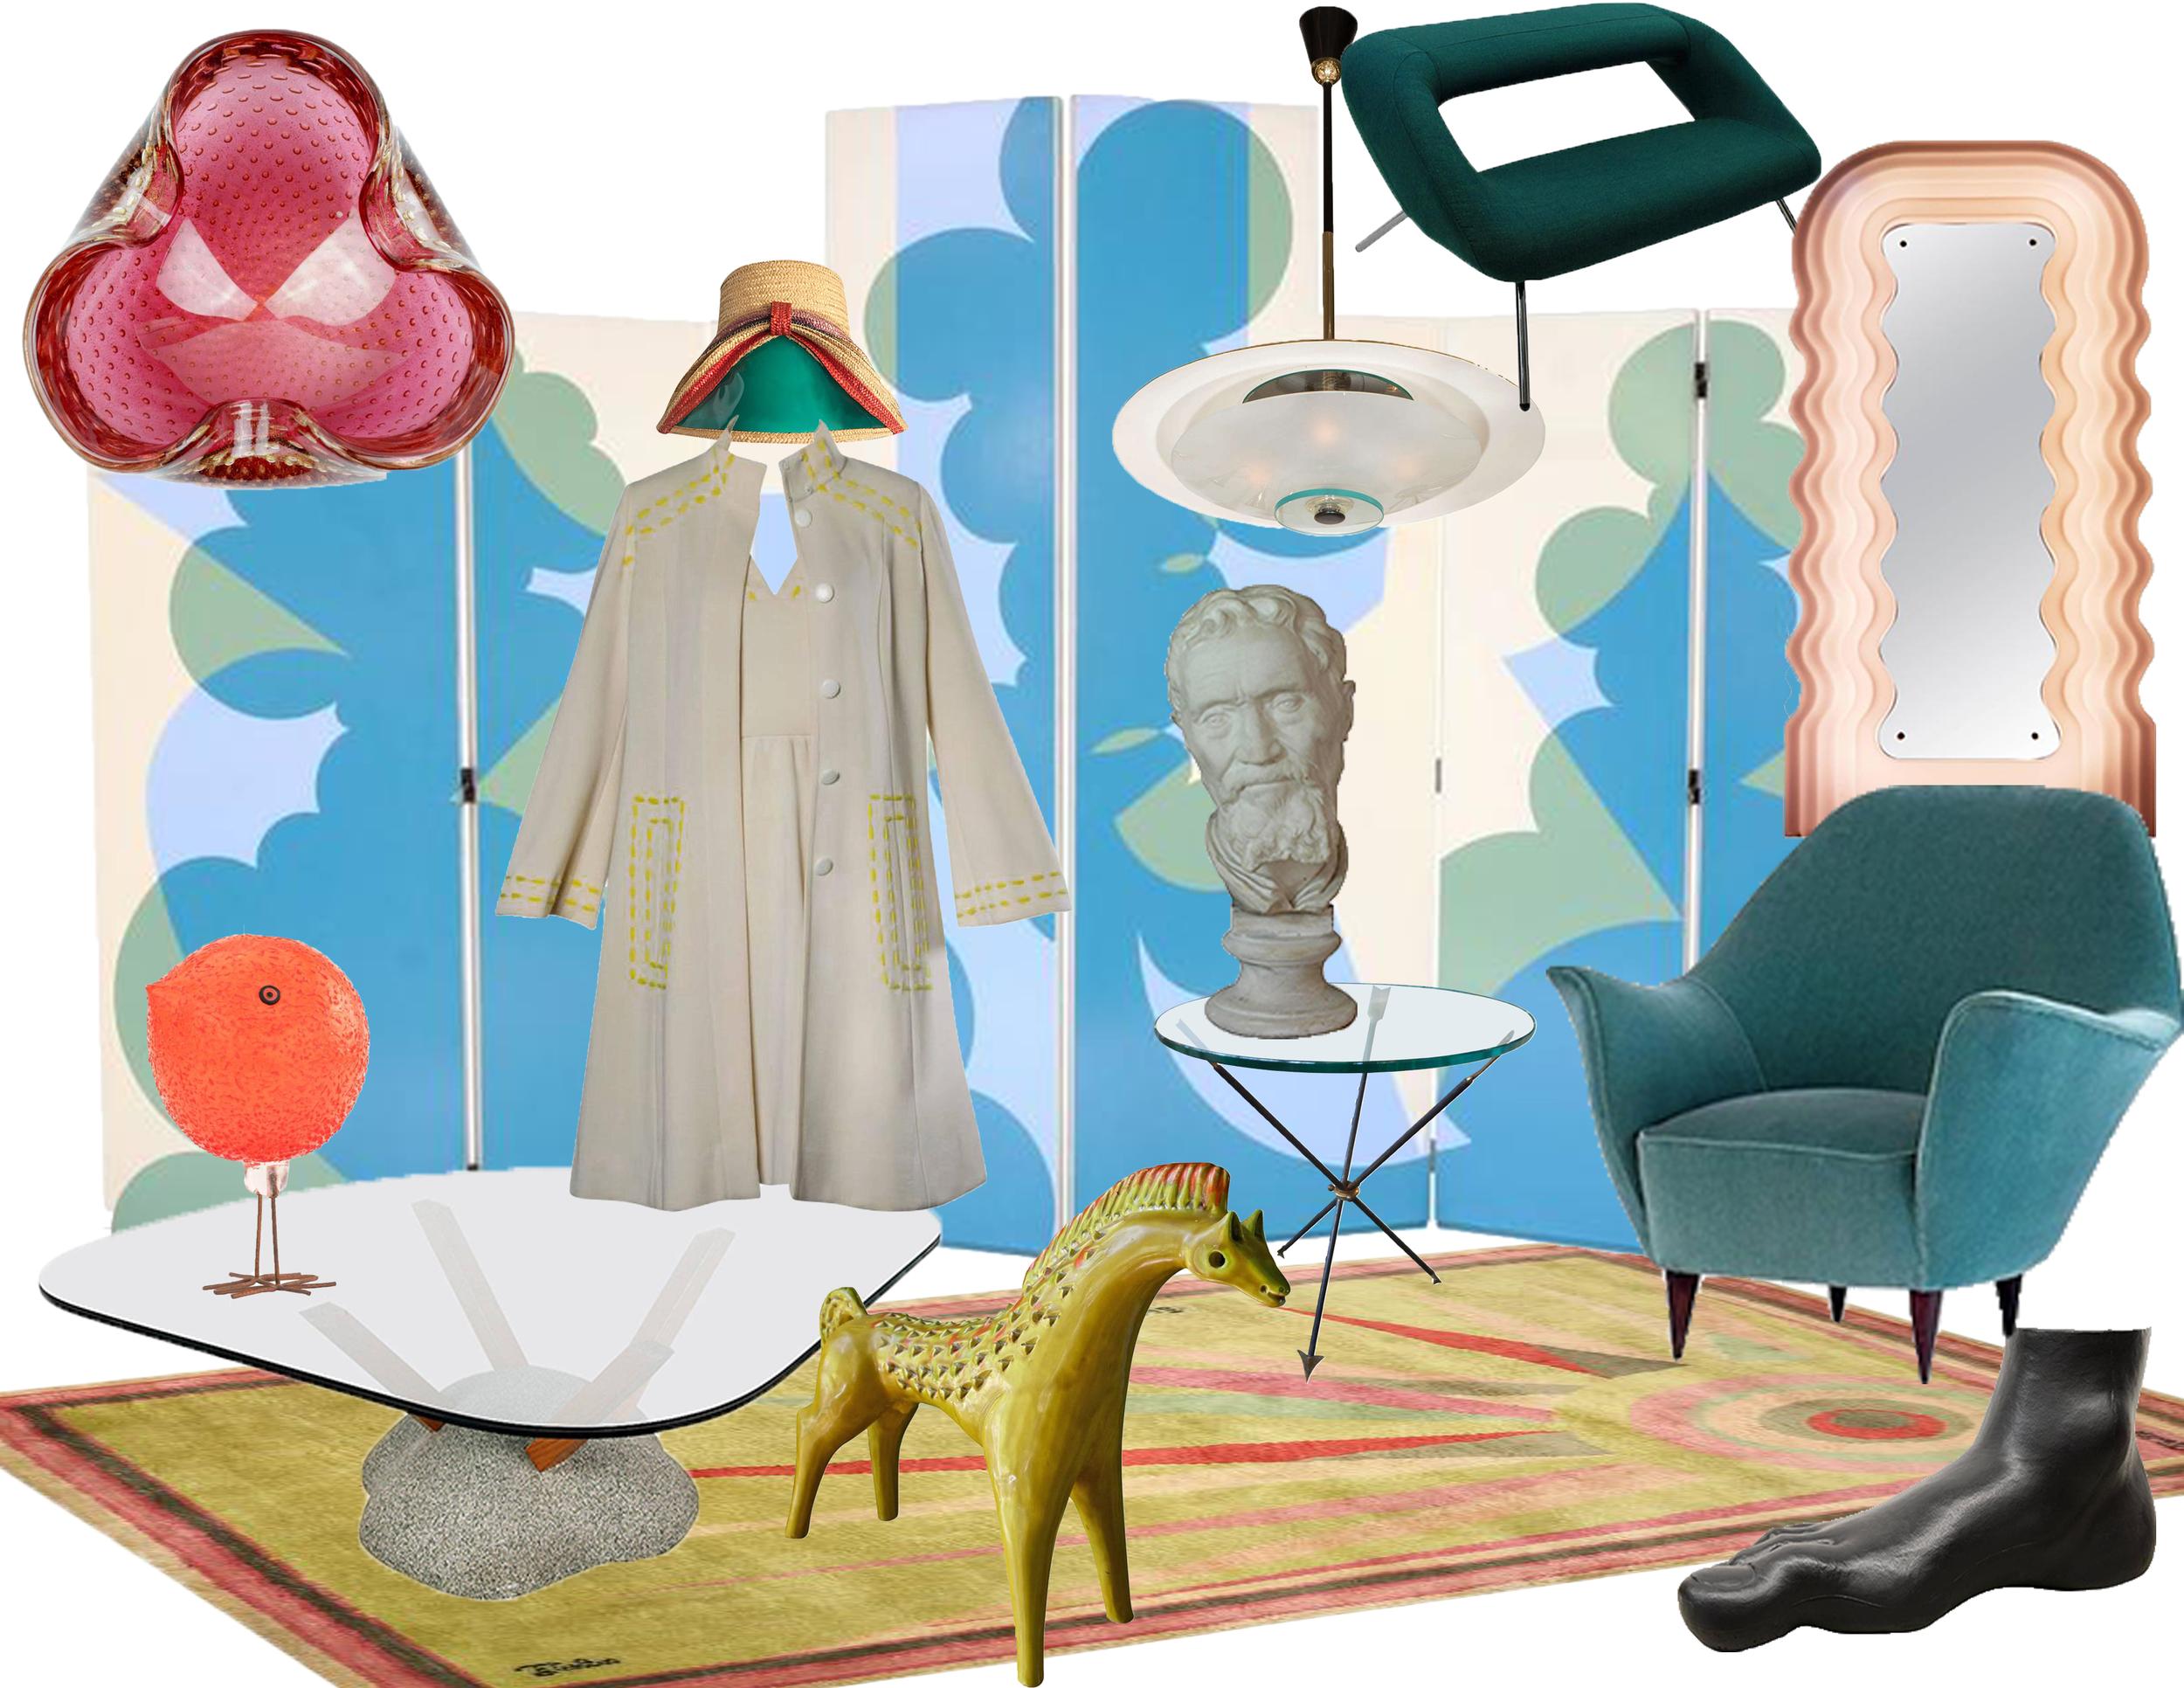 italian-modernism-mood-board-1st-dibs.png